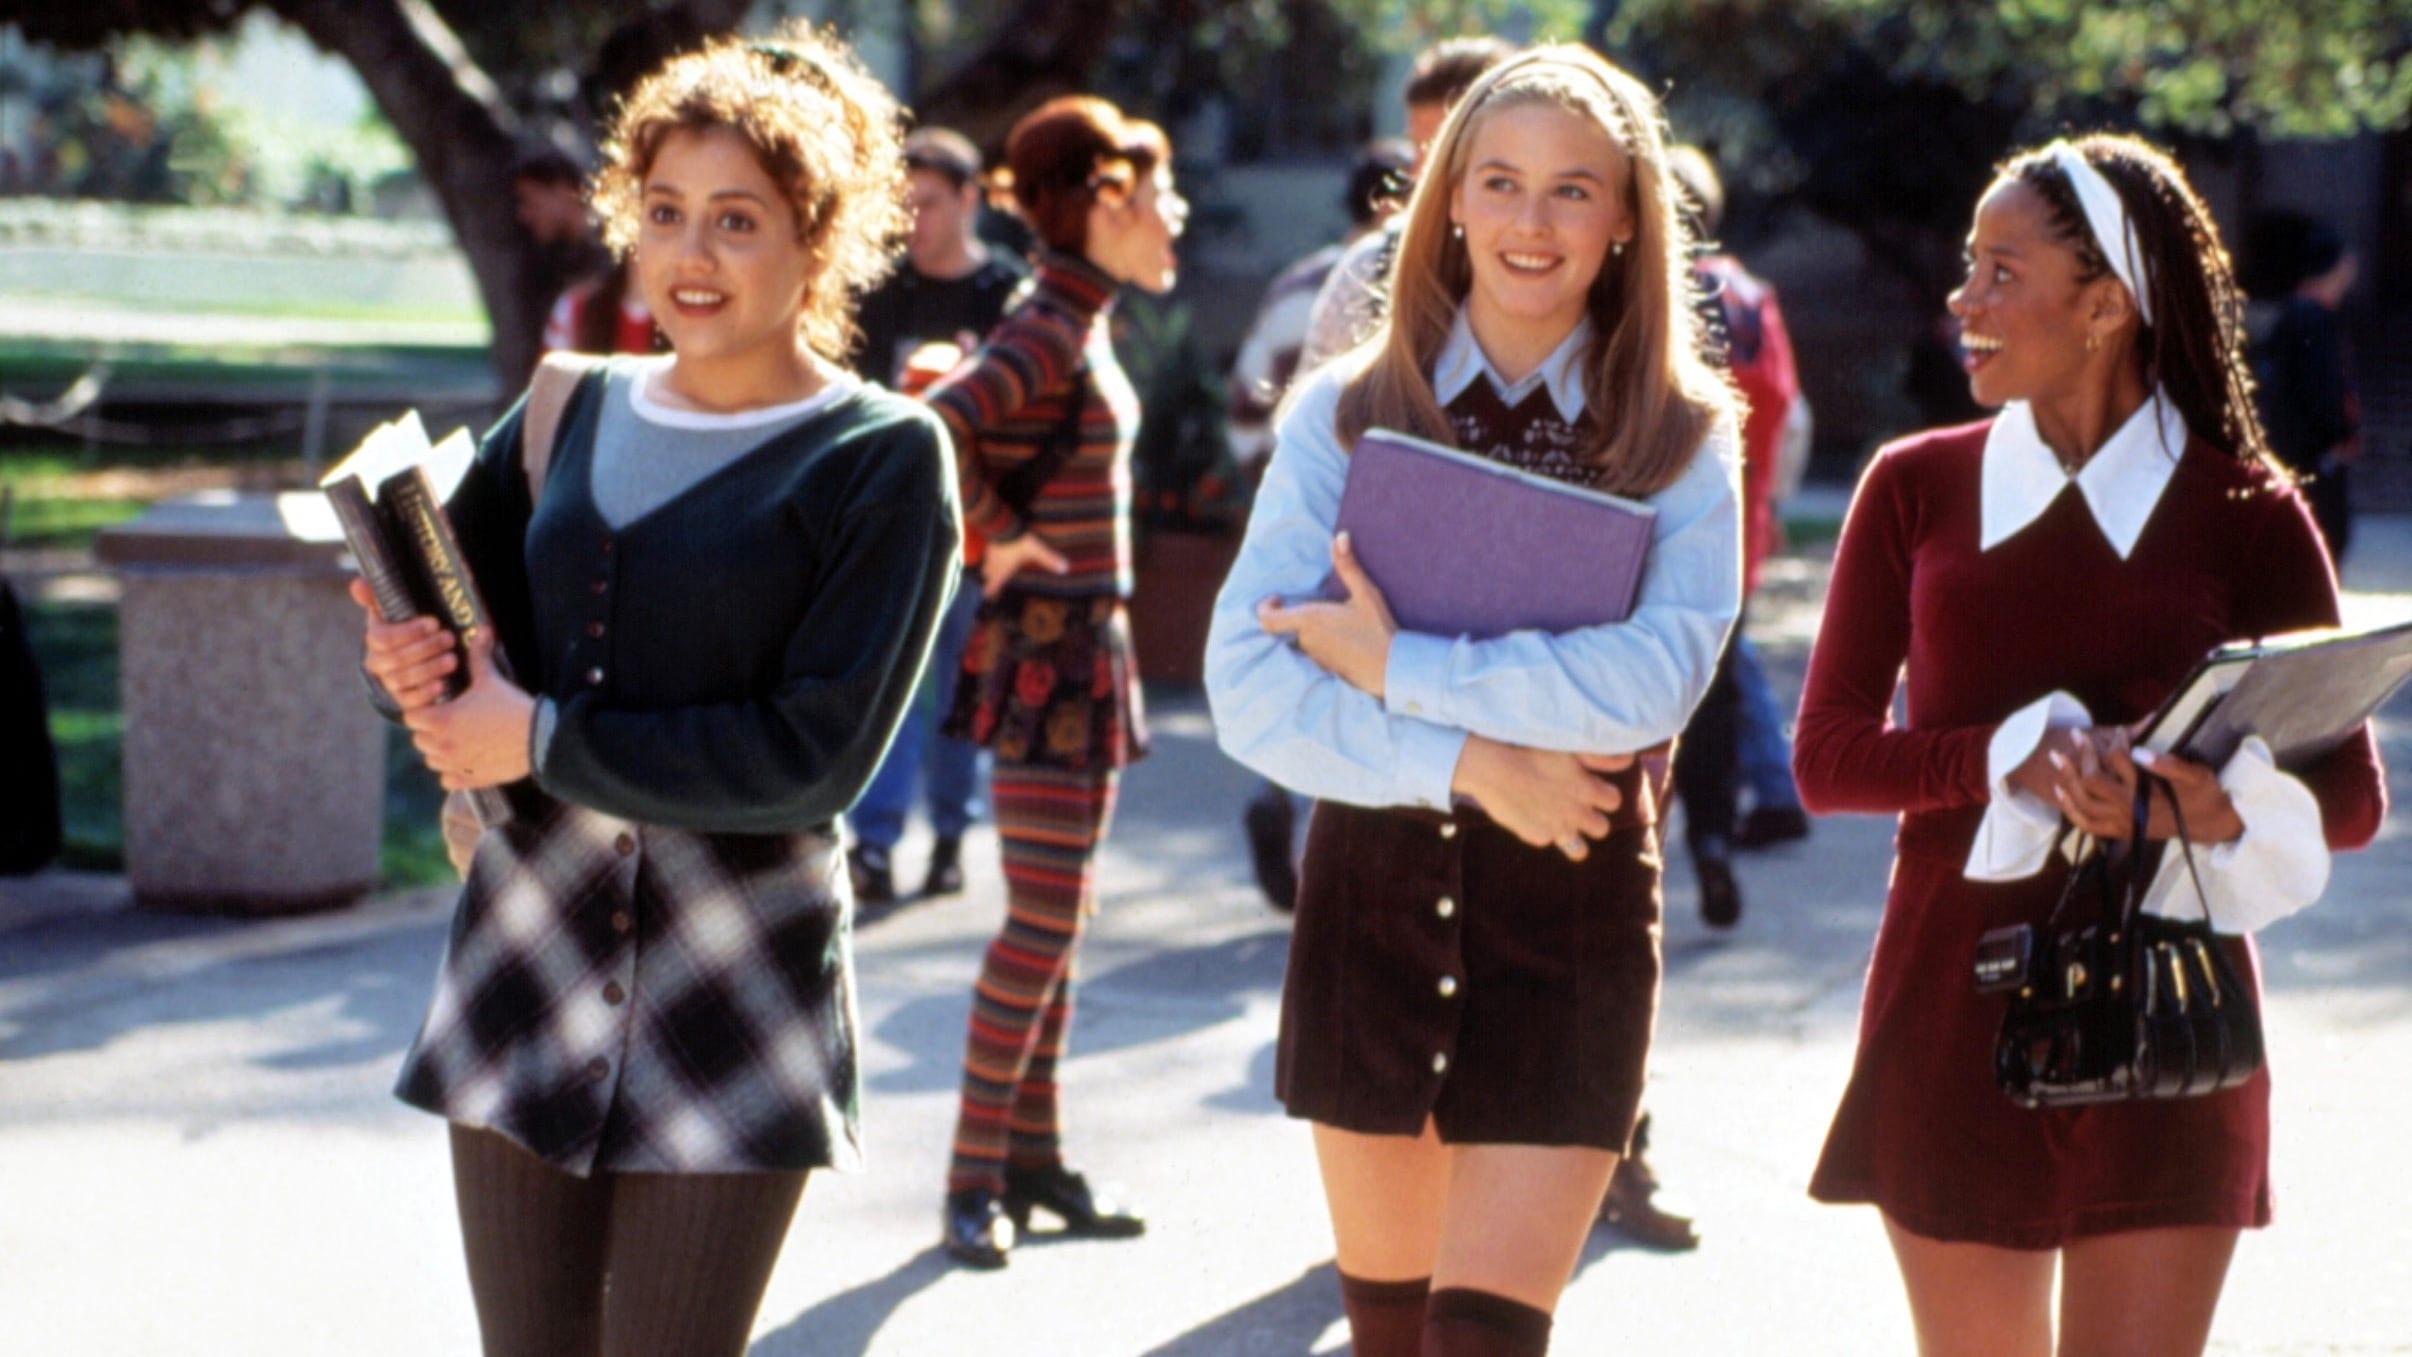 The 25 Most Iconic High School Movies According to Yardbarker